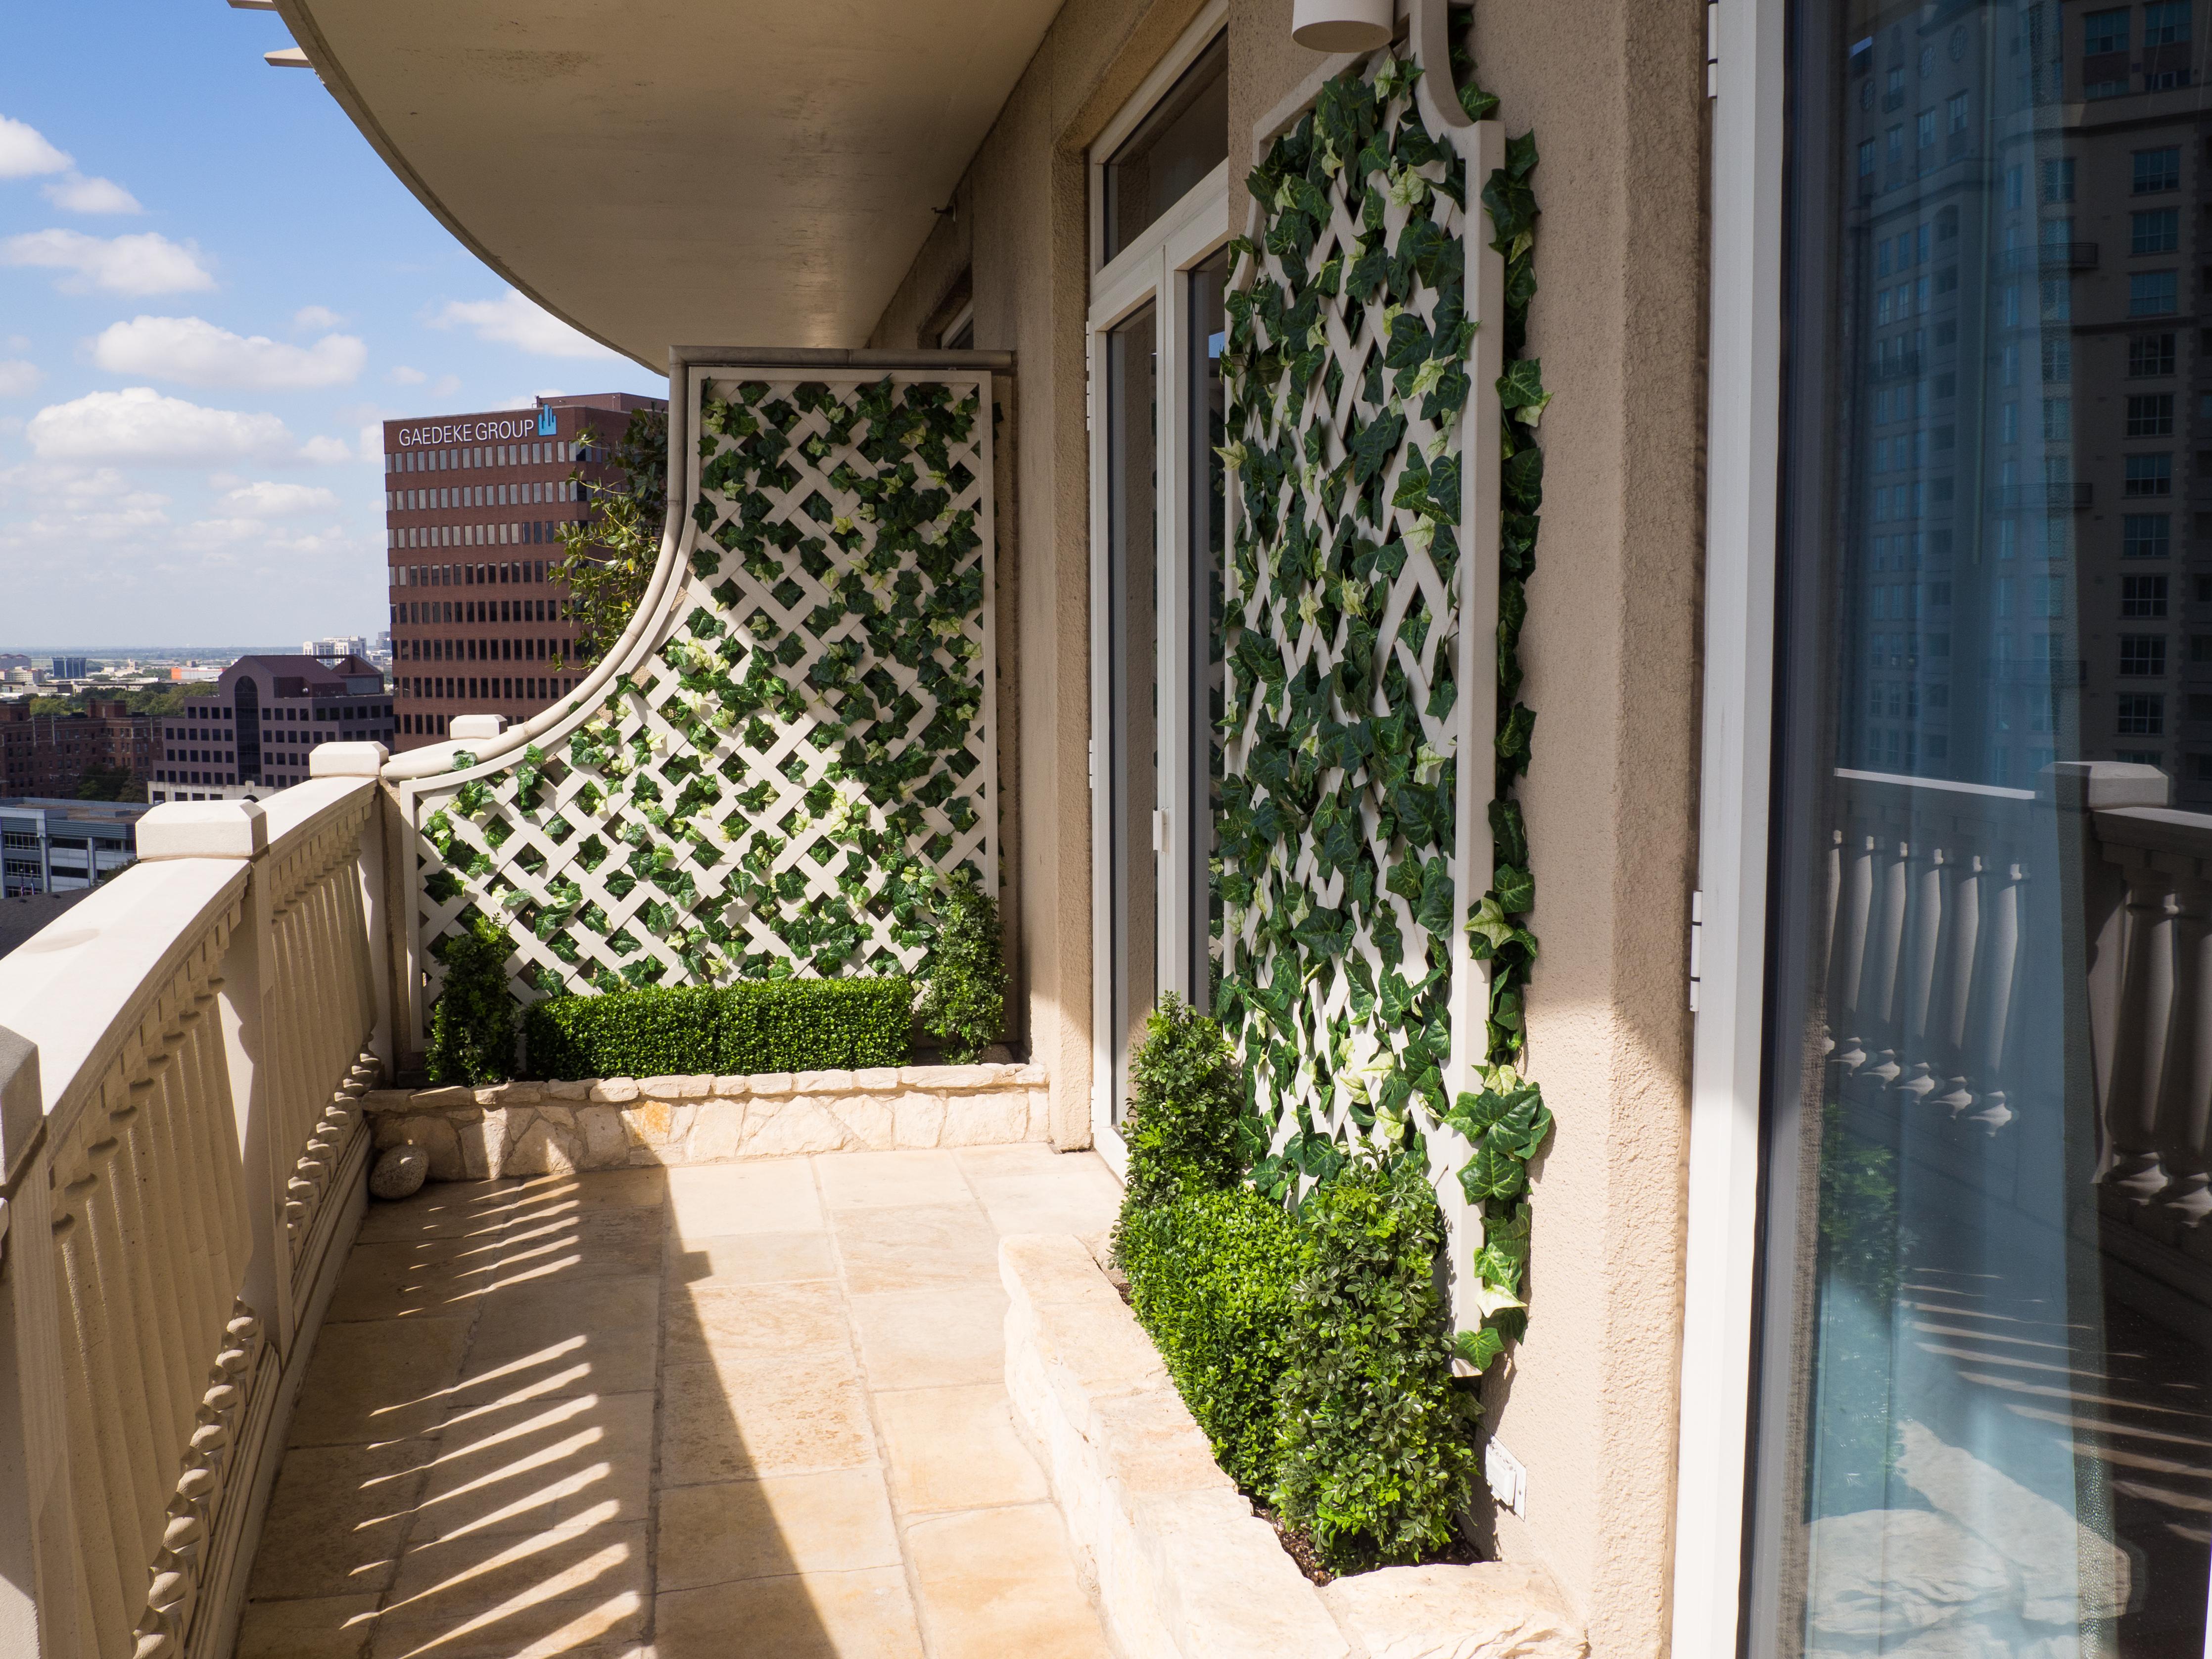 Boxwood hedges and Ivy add elegance